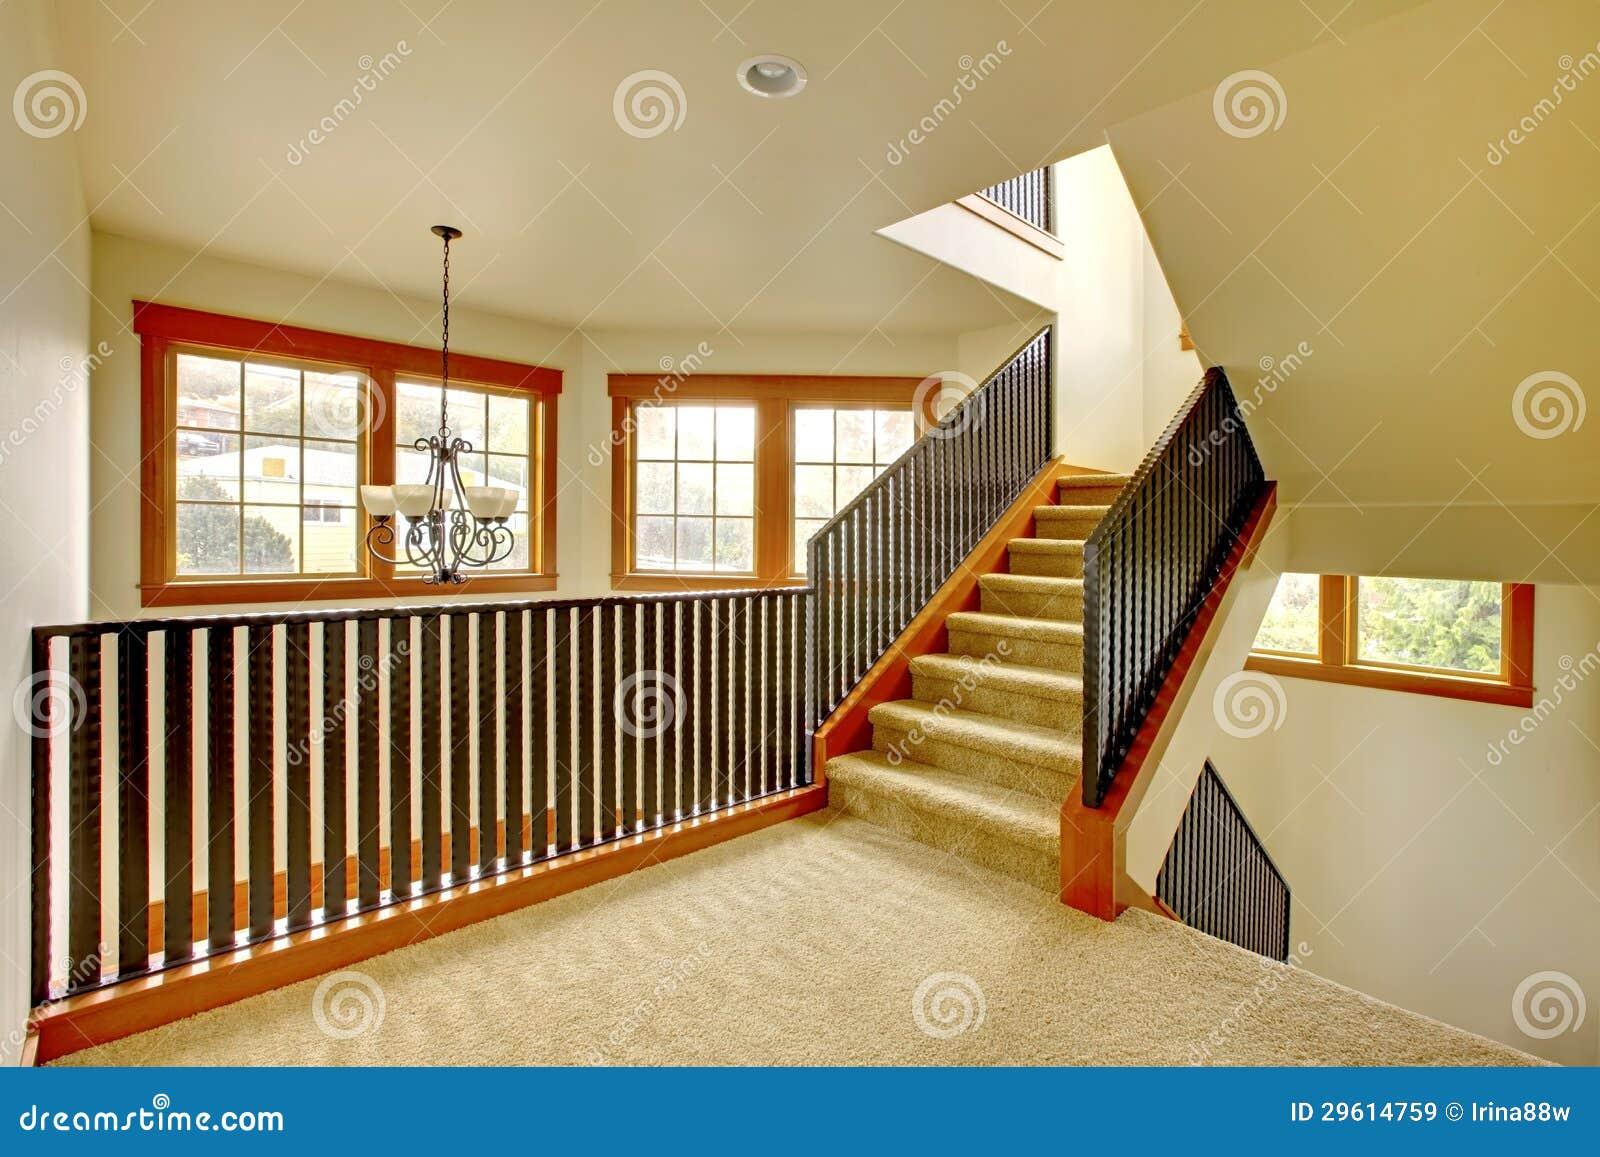 Maison De Luxe Interieur Escalier